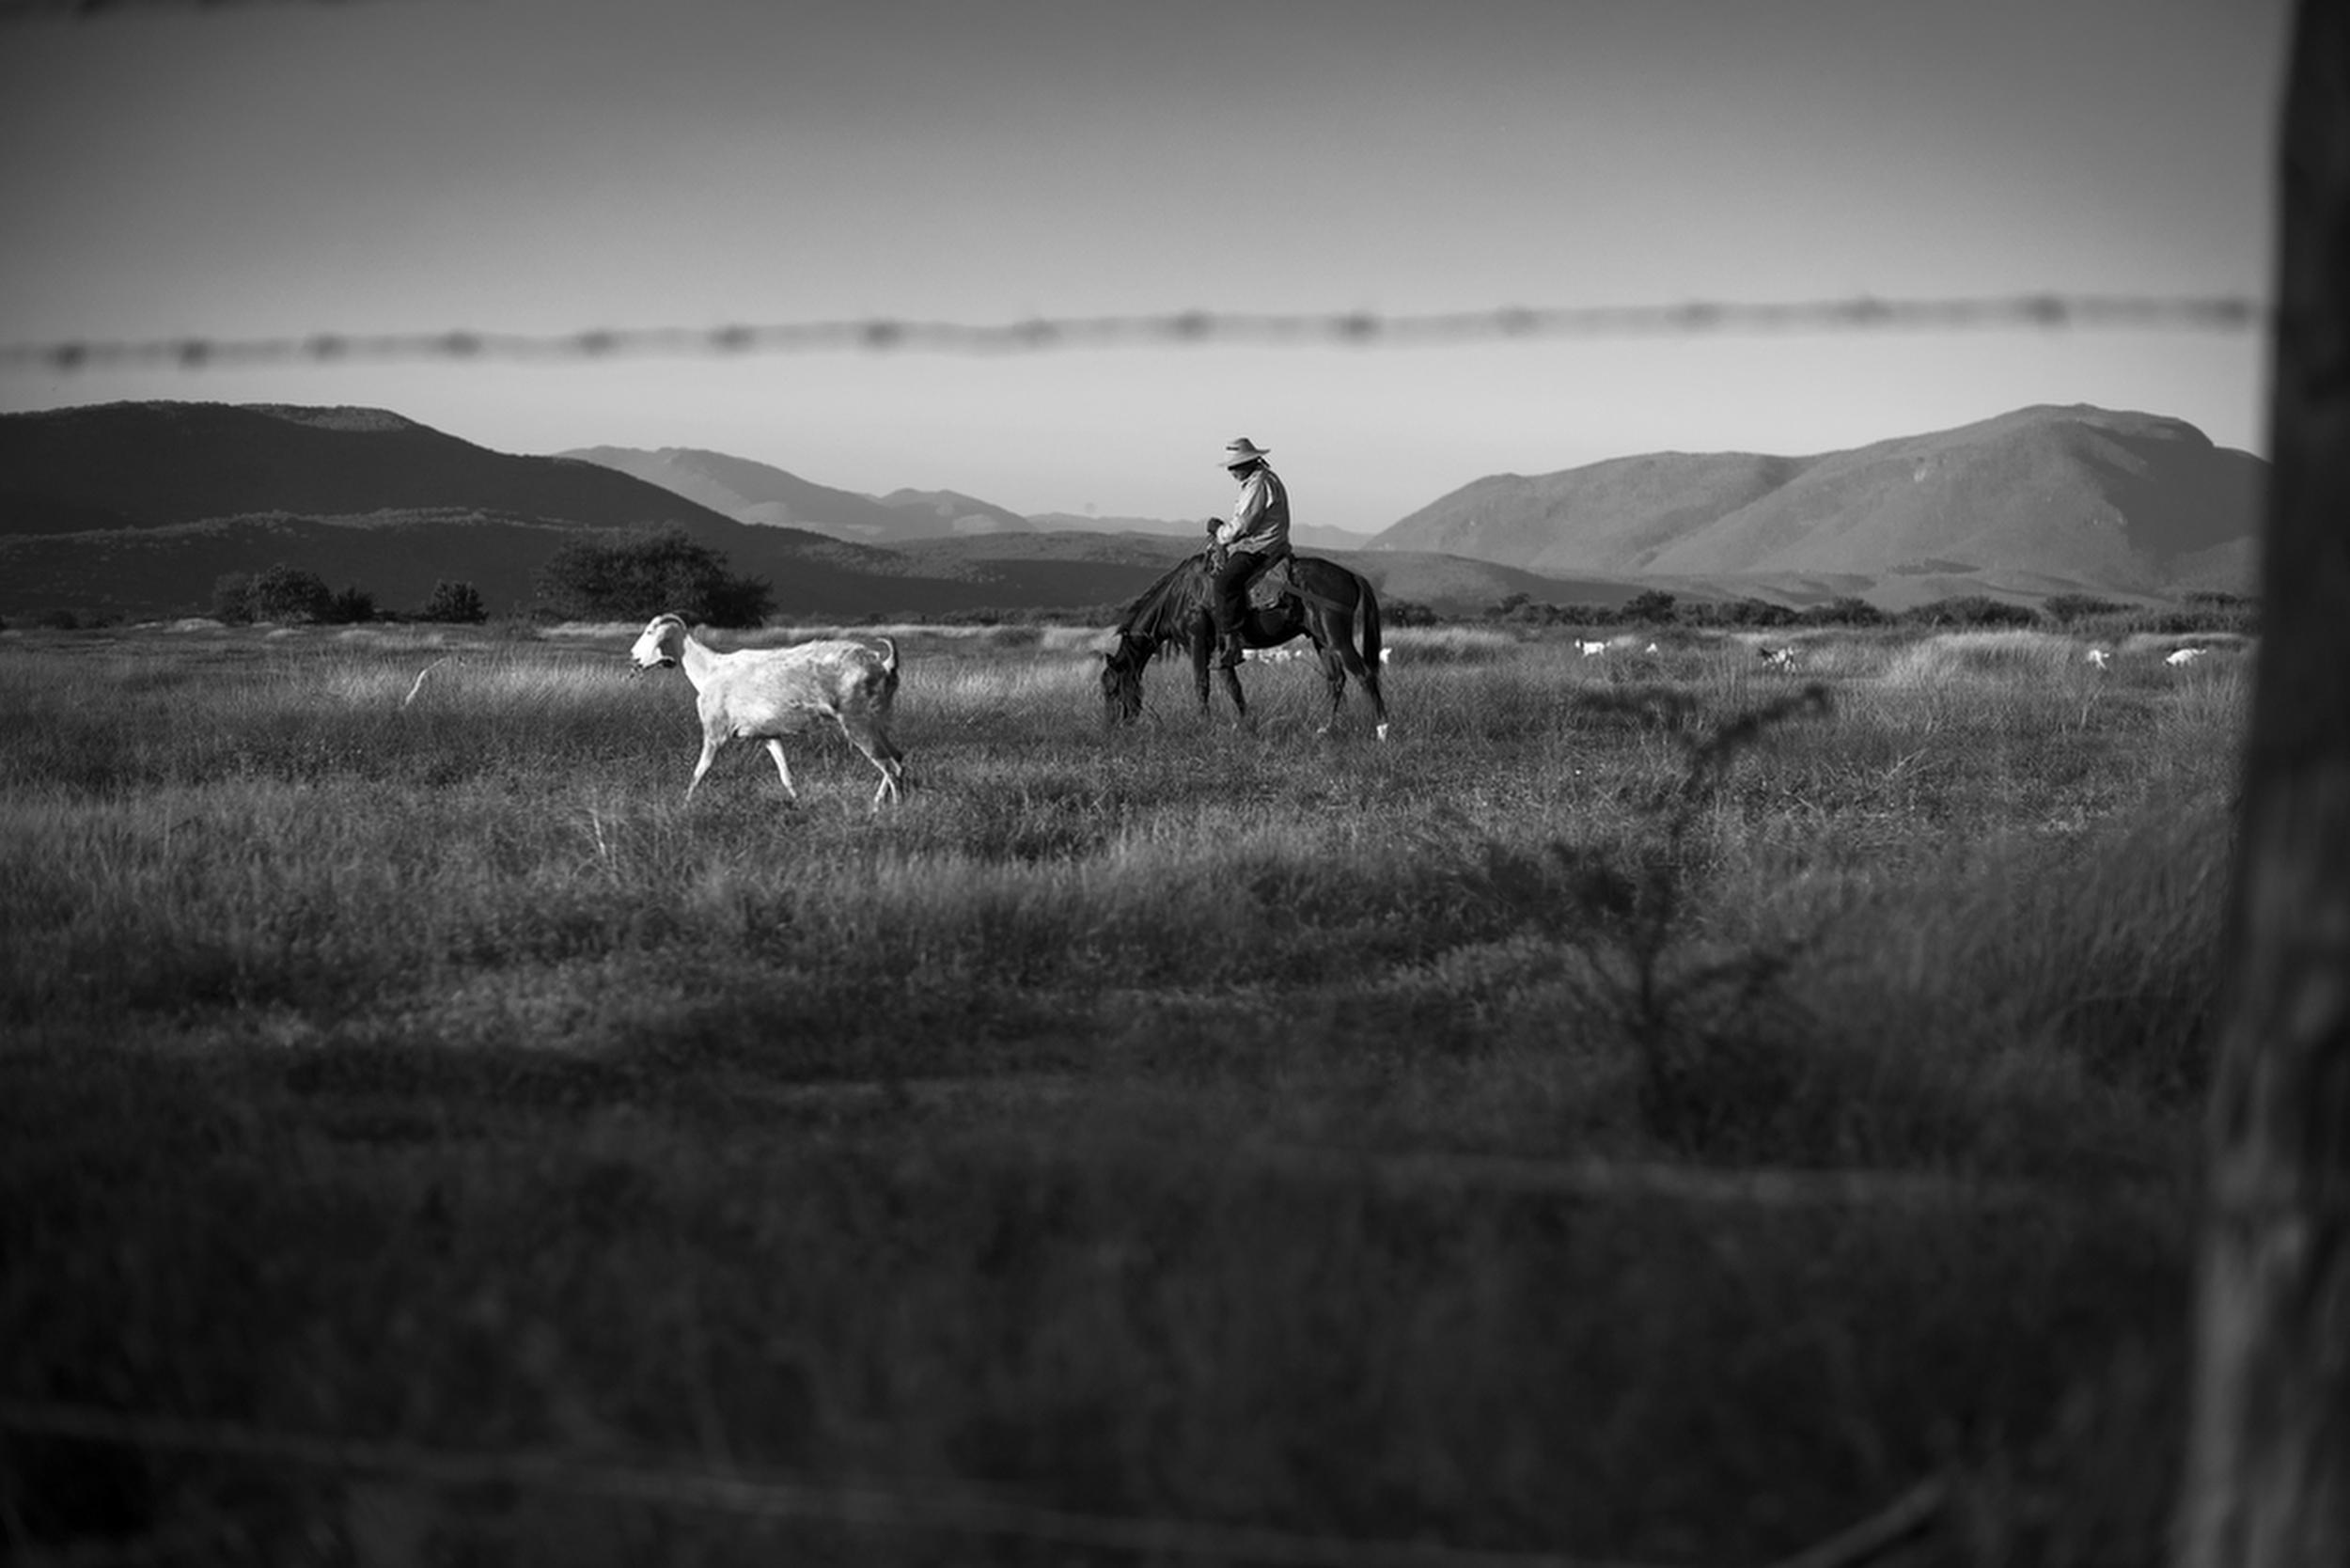 A farmer in Cocula, Mexico. December 5, 2014.